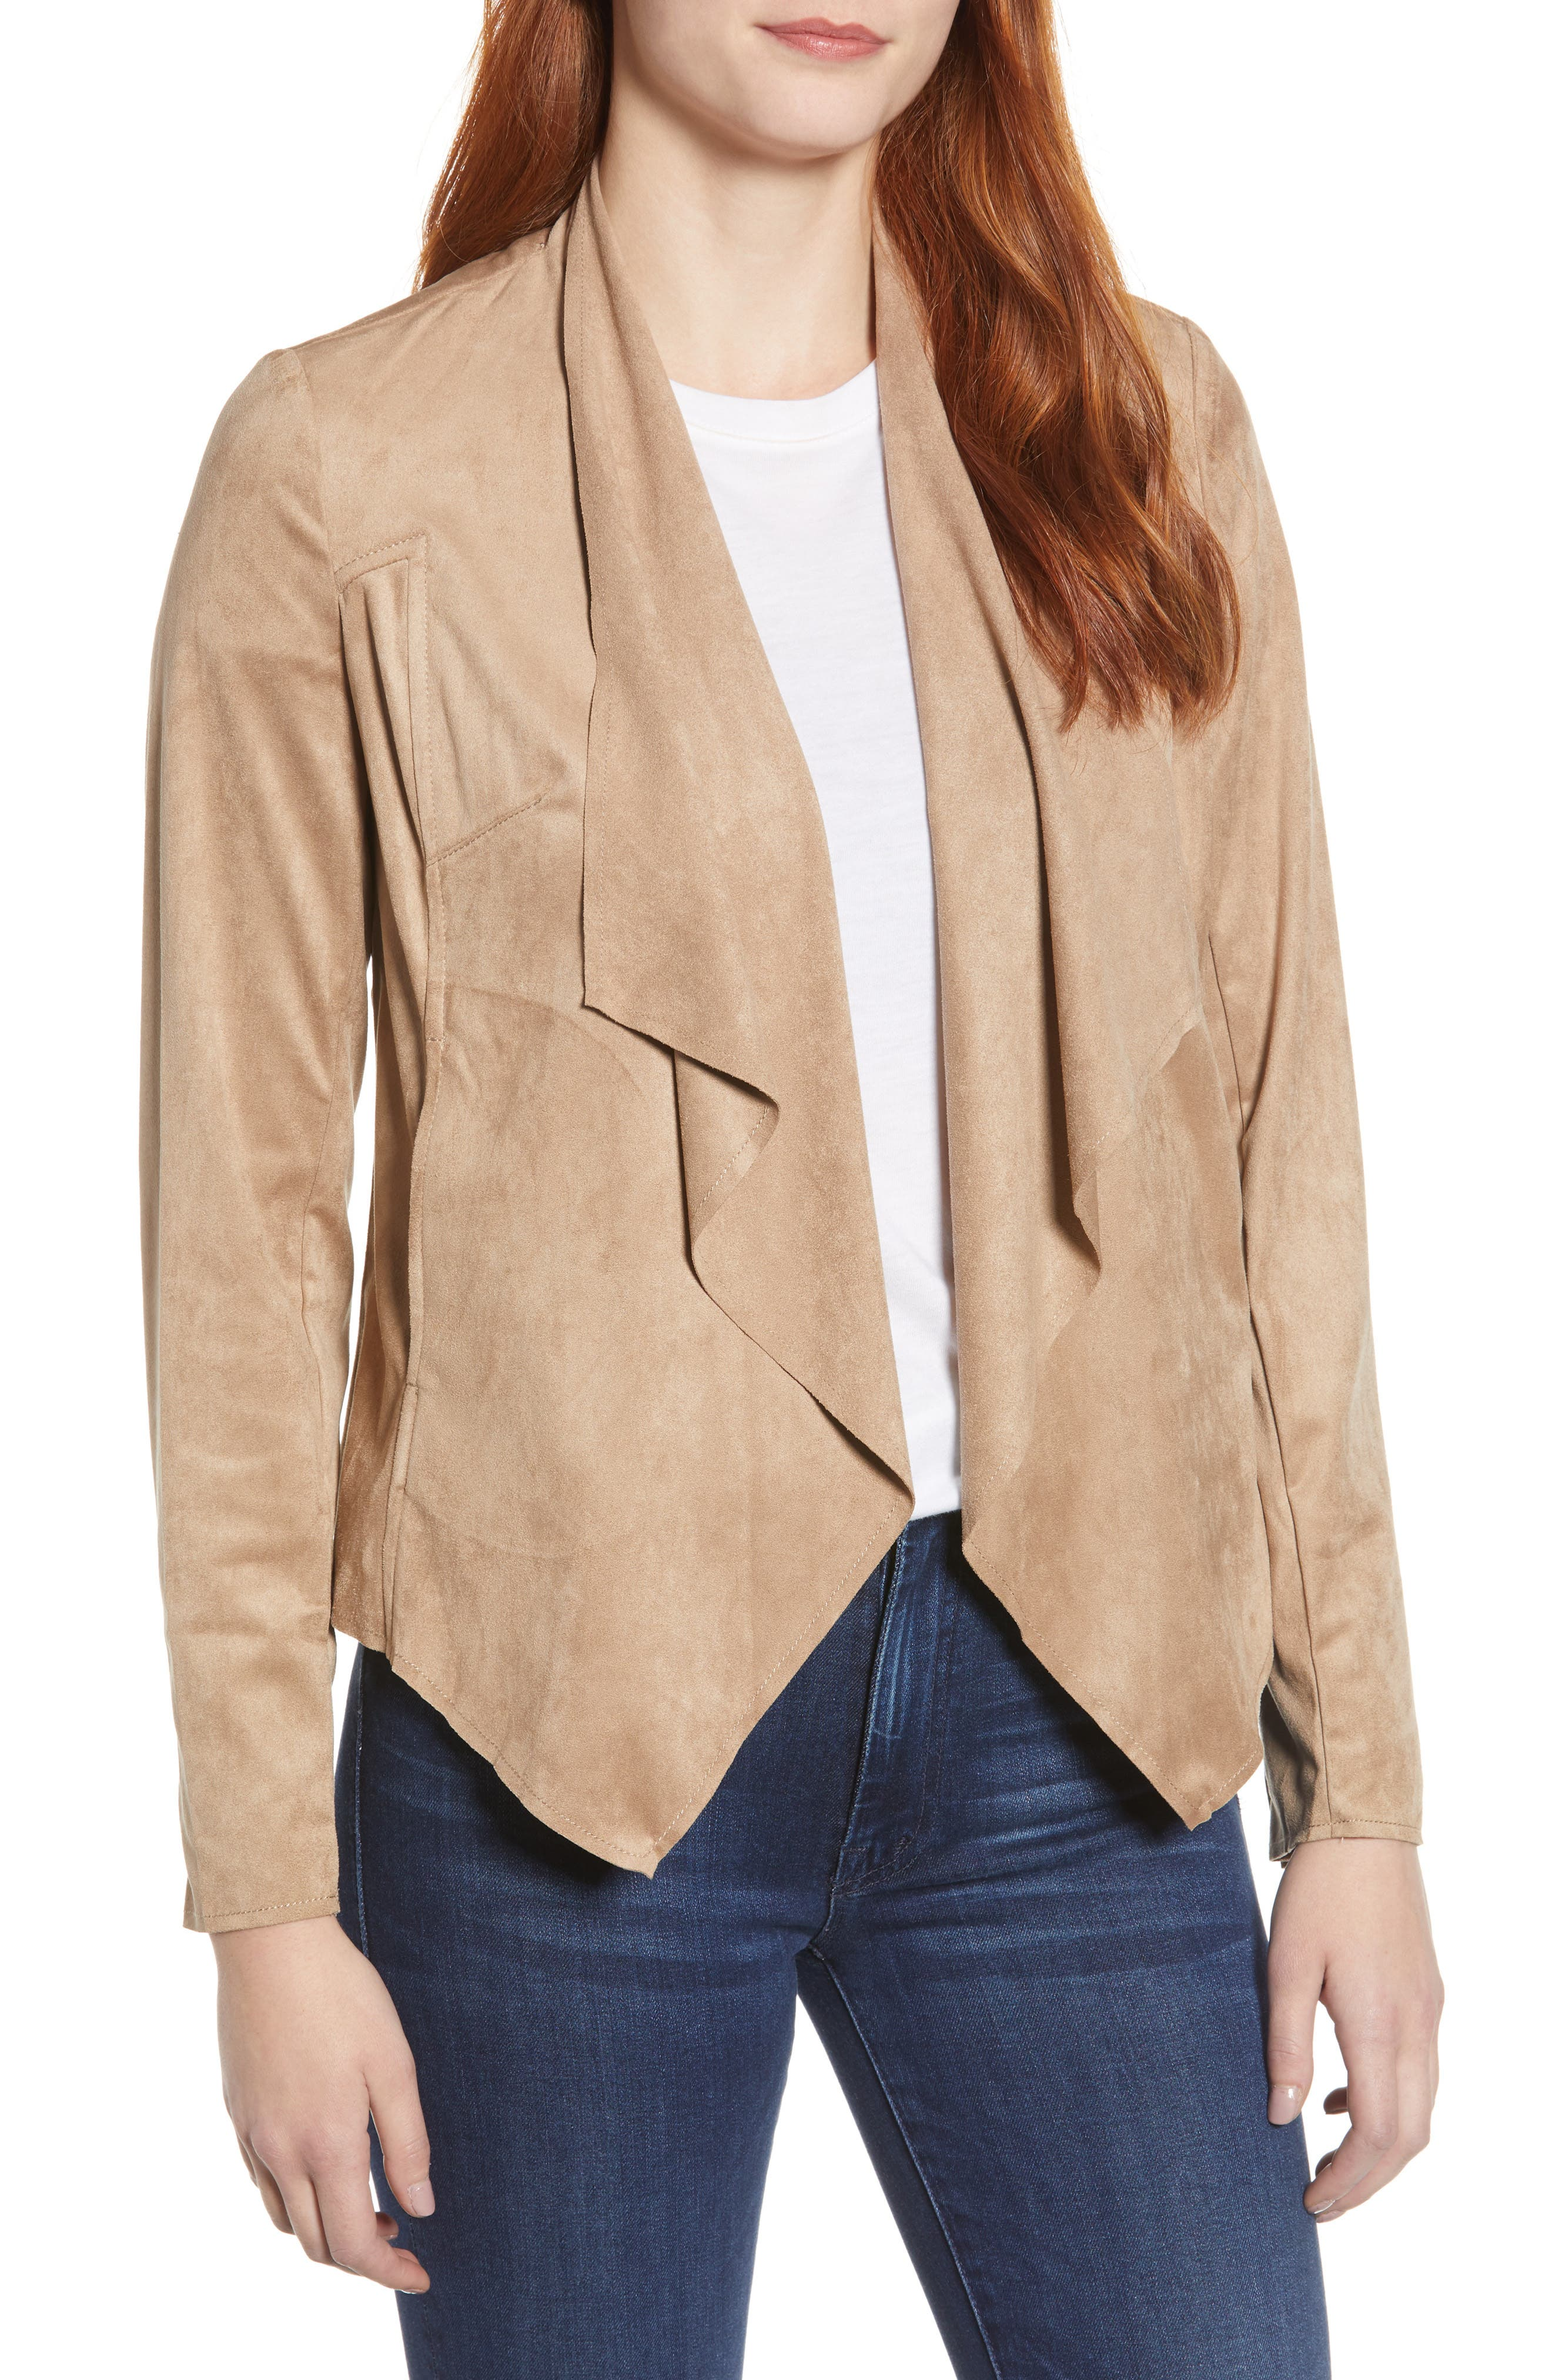 Tayanita Faux Suede Jacket,                             Main thumbnail 1, color,                             380